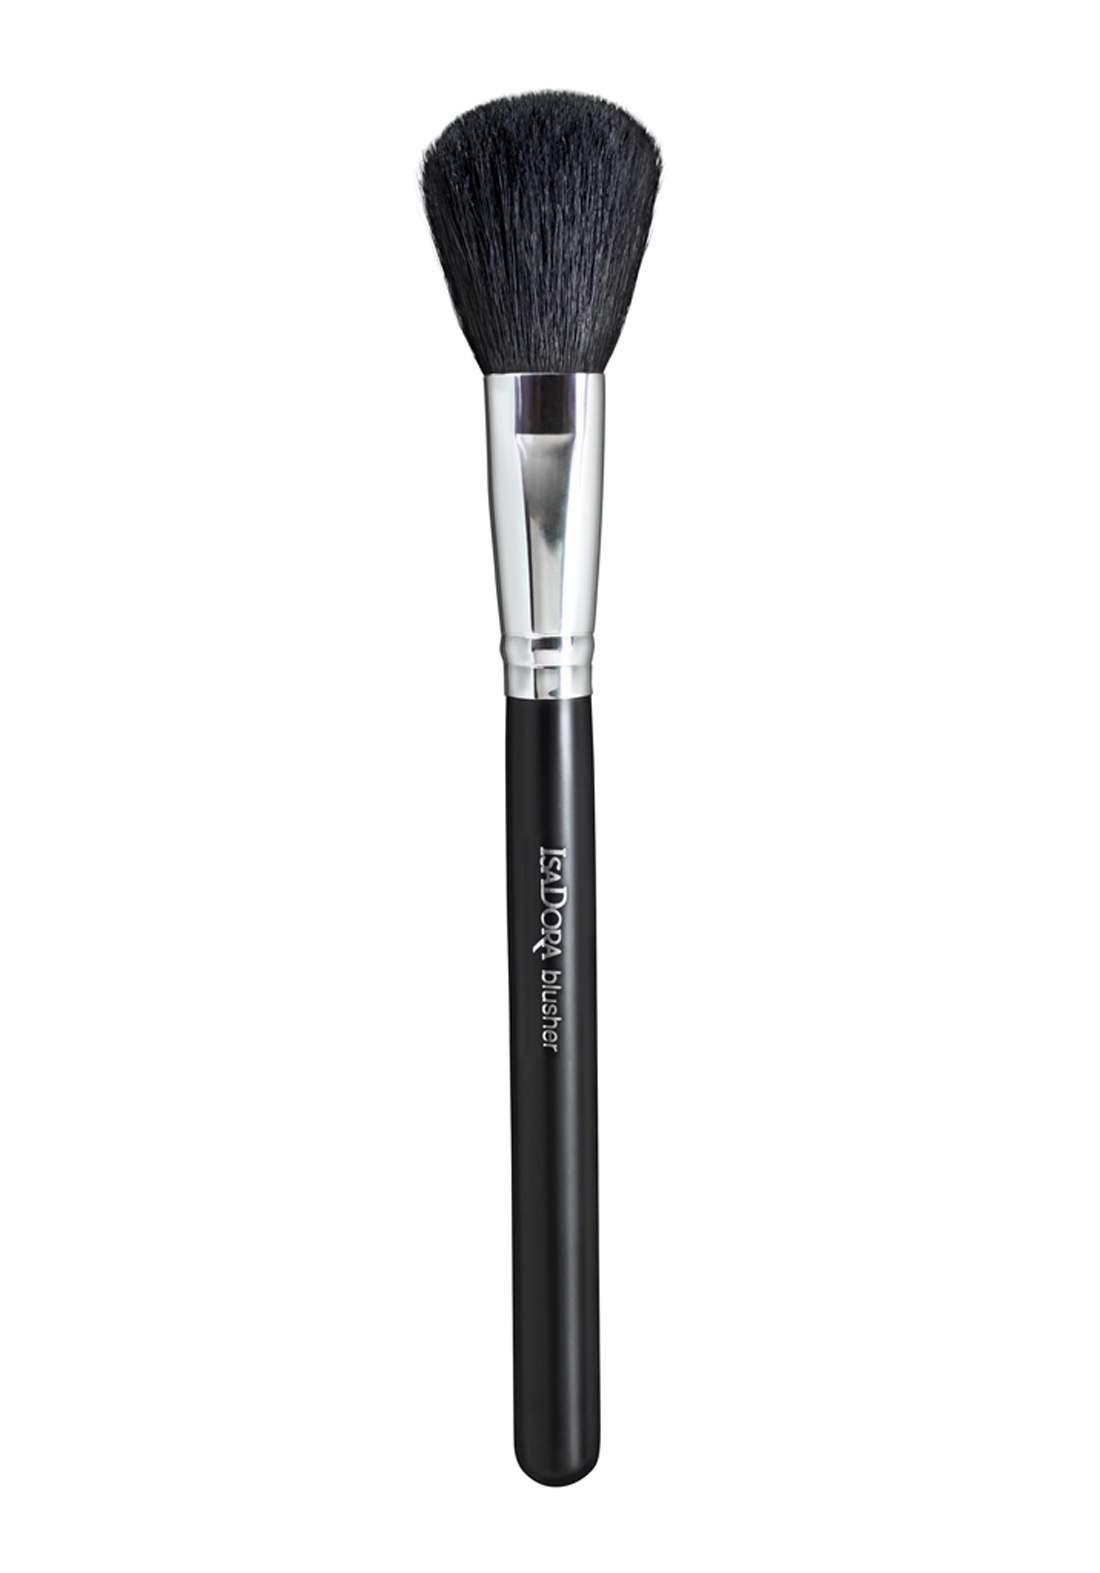 314178 Isadora Accessories - Blush Brush فرشاة أحمر الخدود